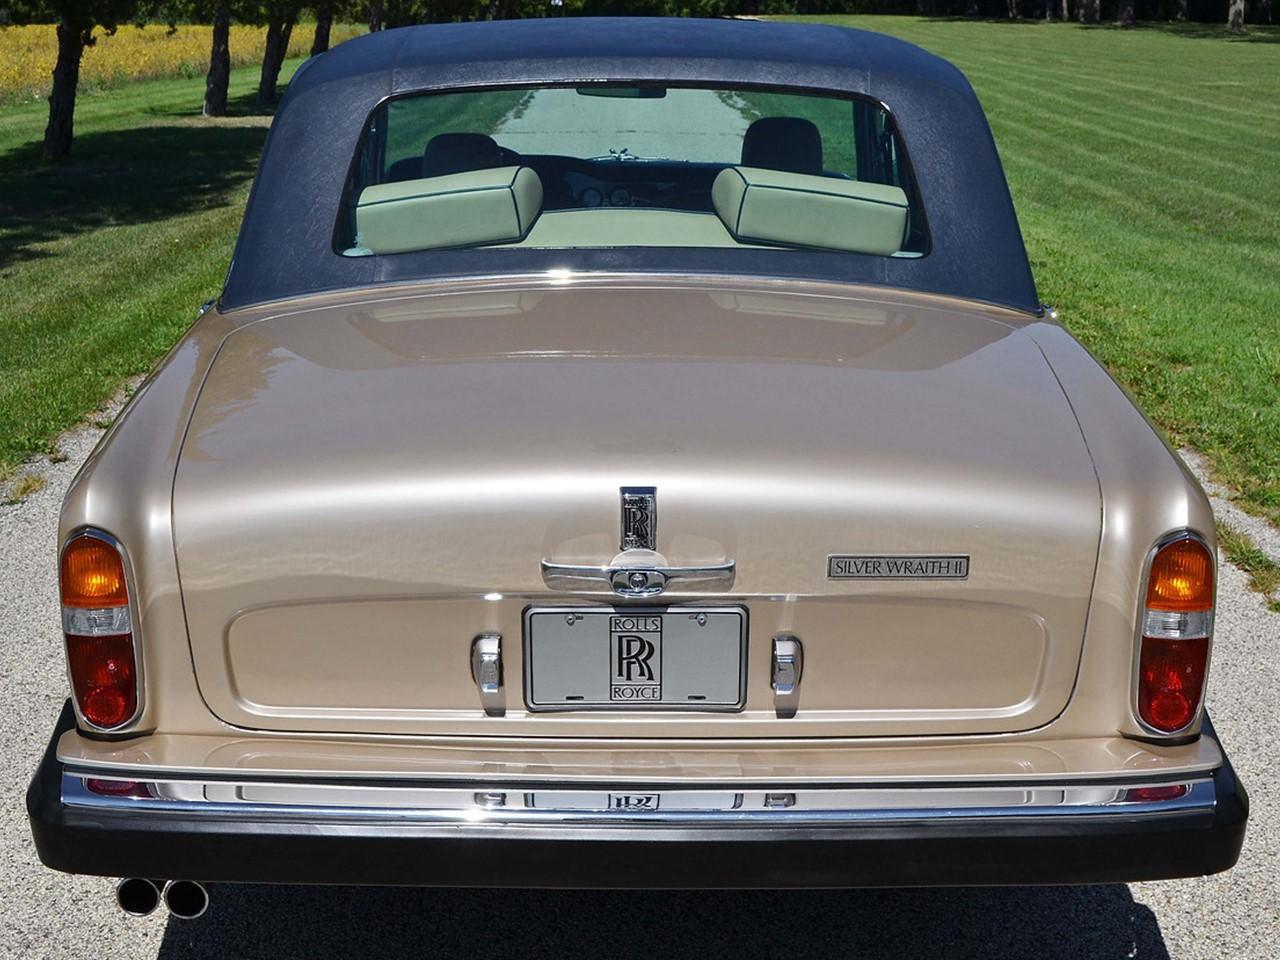 1980 Silver Wraith II 10